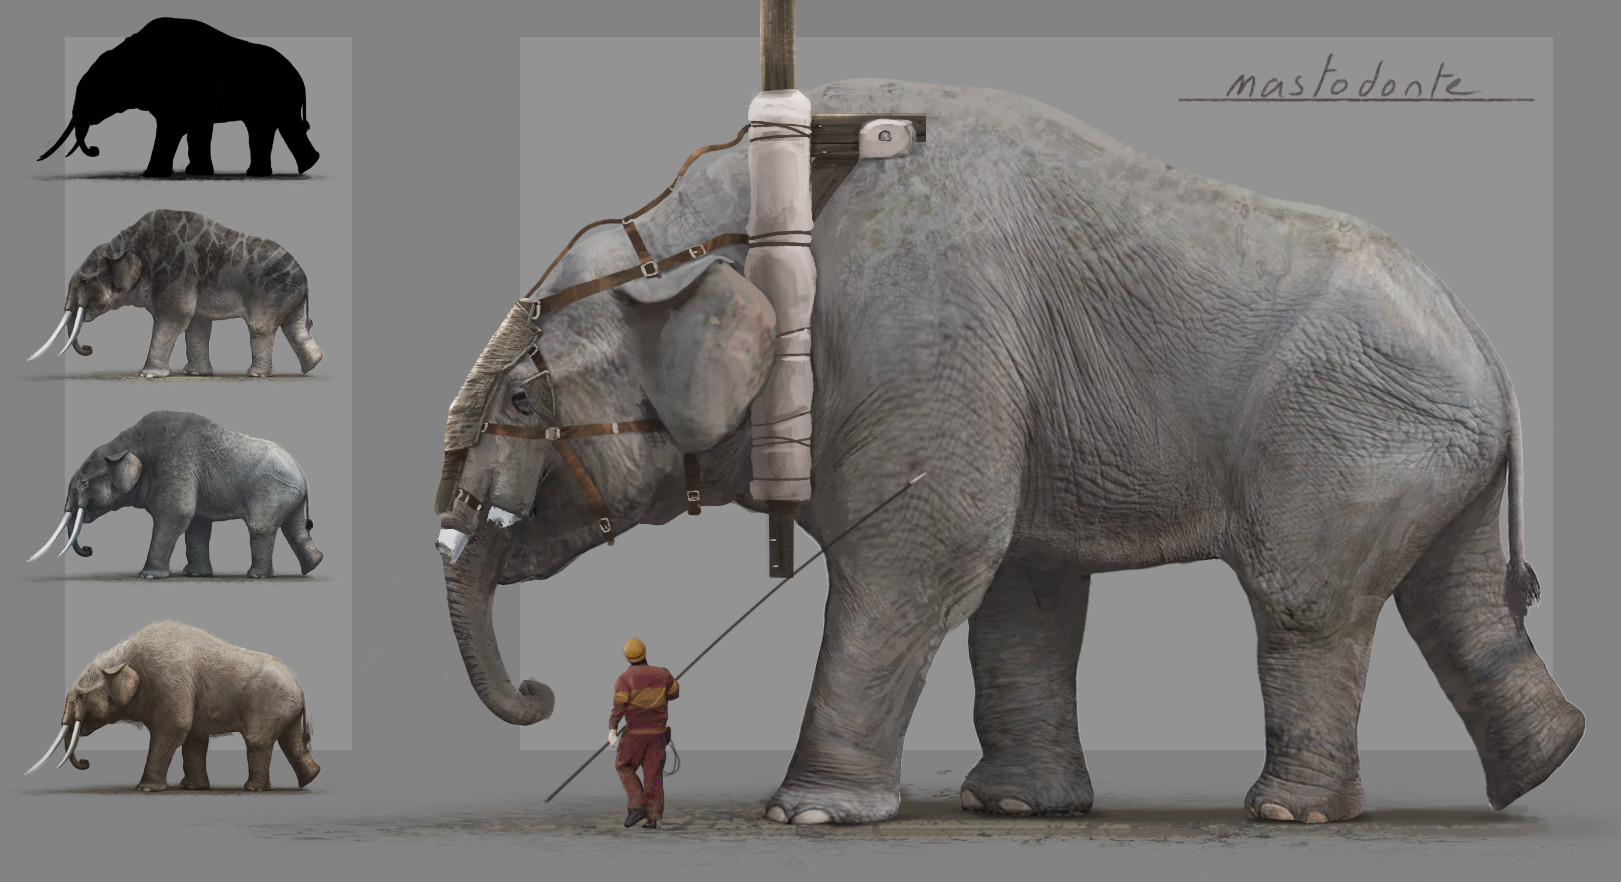 Julien gauthier bangkok2184 06 springlife factory mastodonte